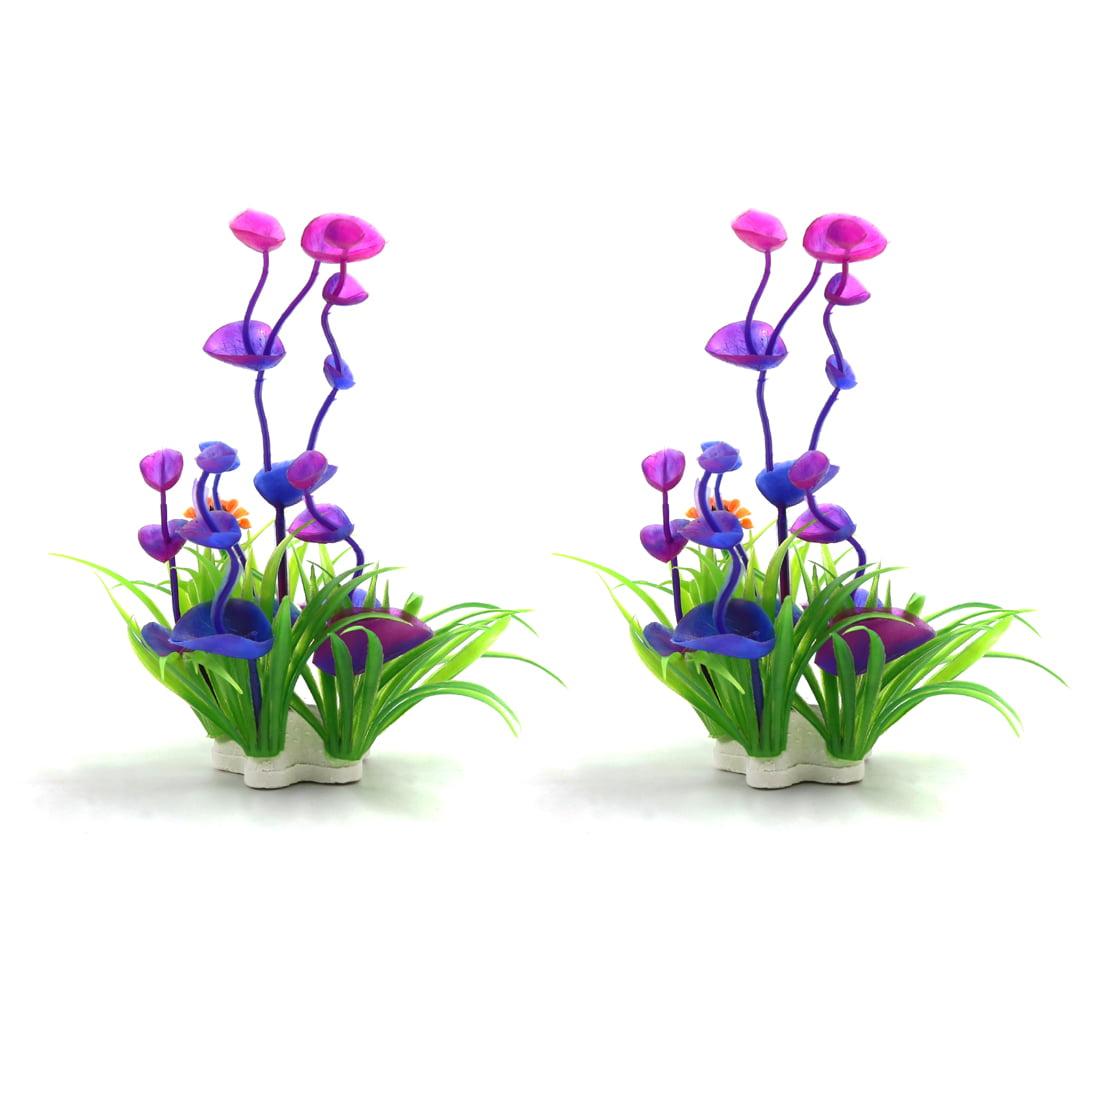 2pcs Purple Plastic Plant Betta Tank Fishbowl Aquascape Decor Ornament w/ Stand - image 3 of 3